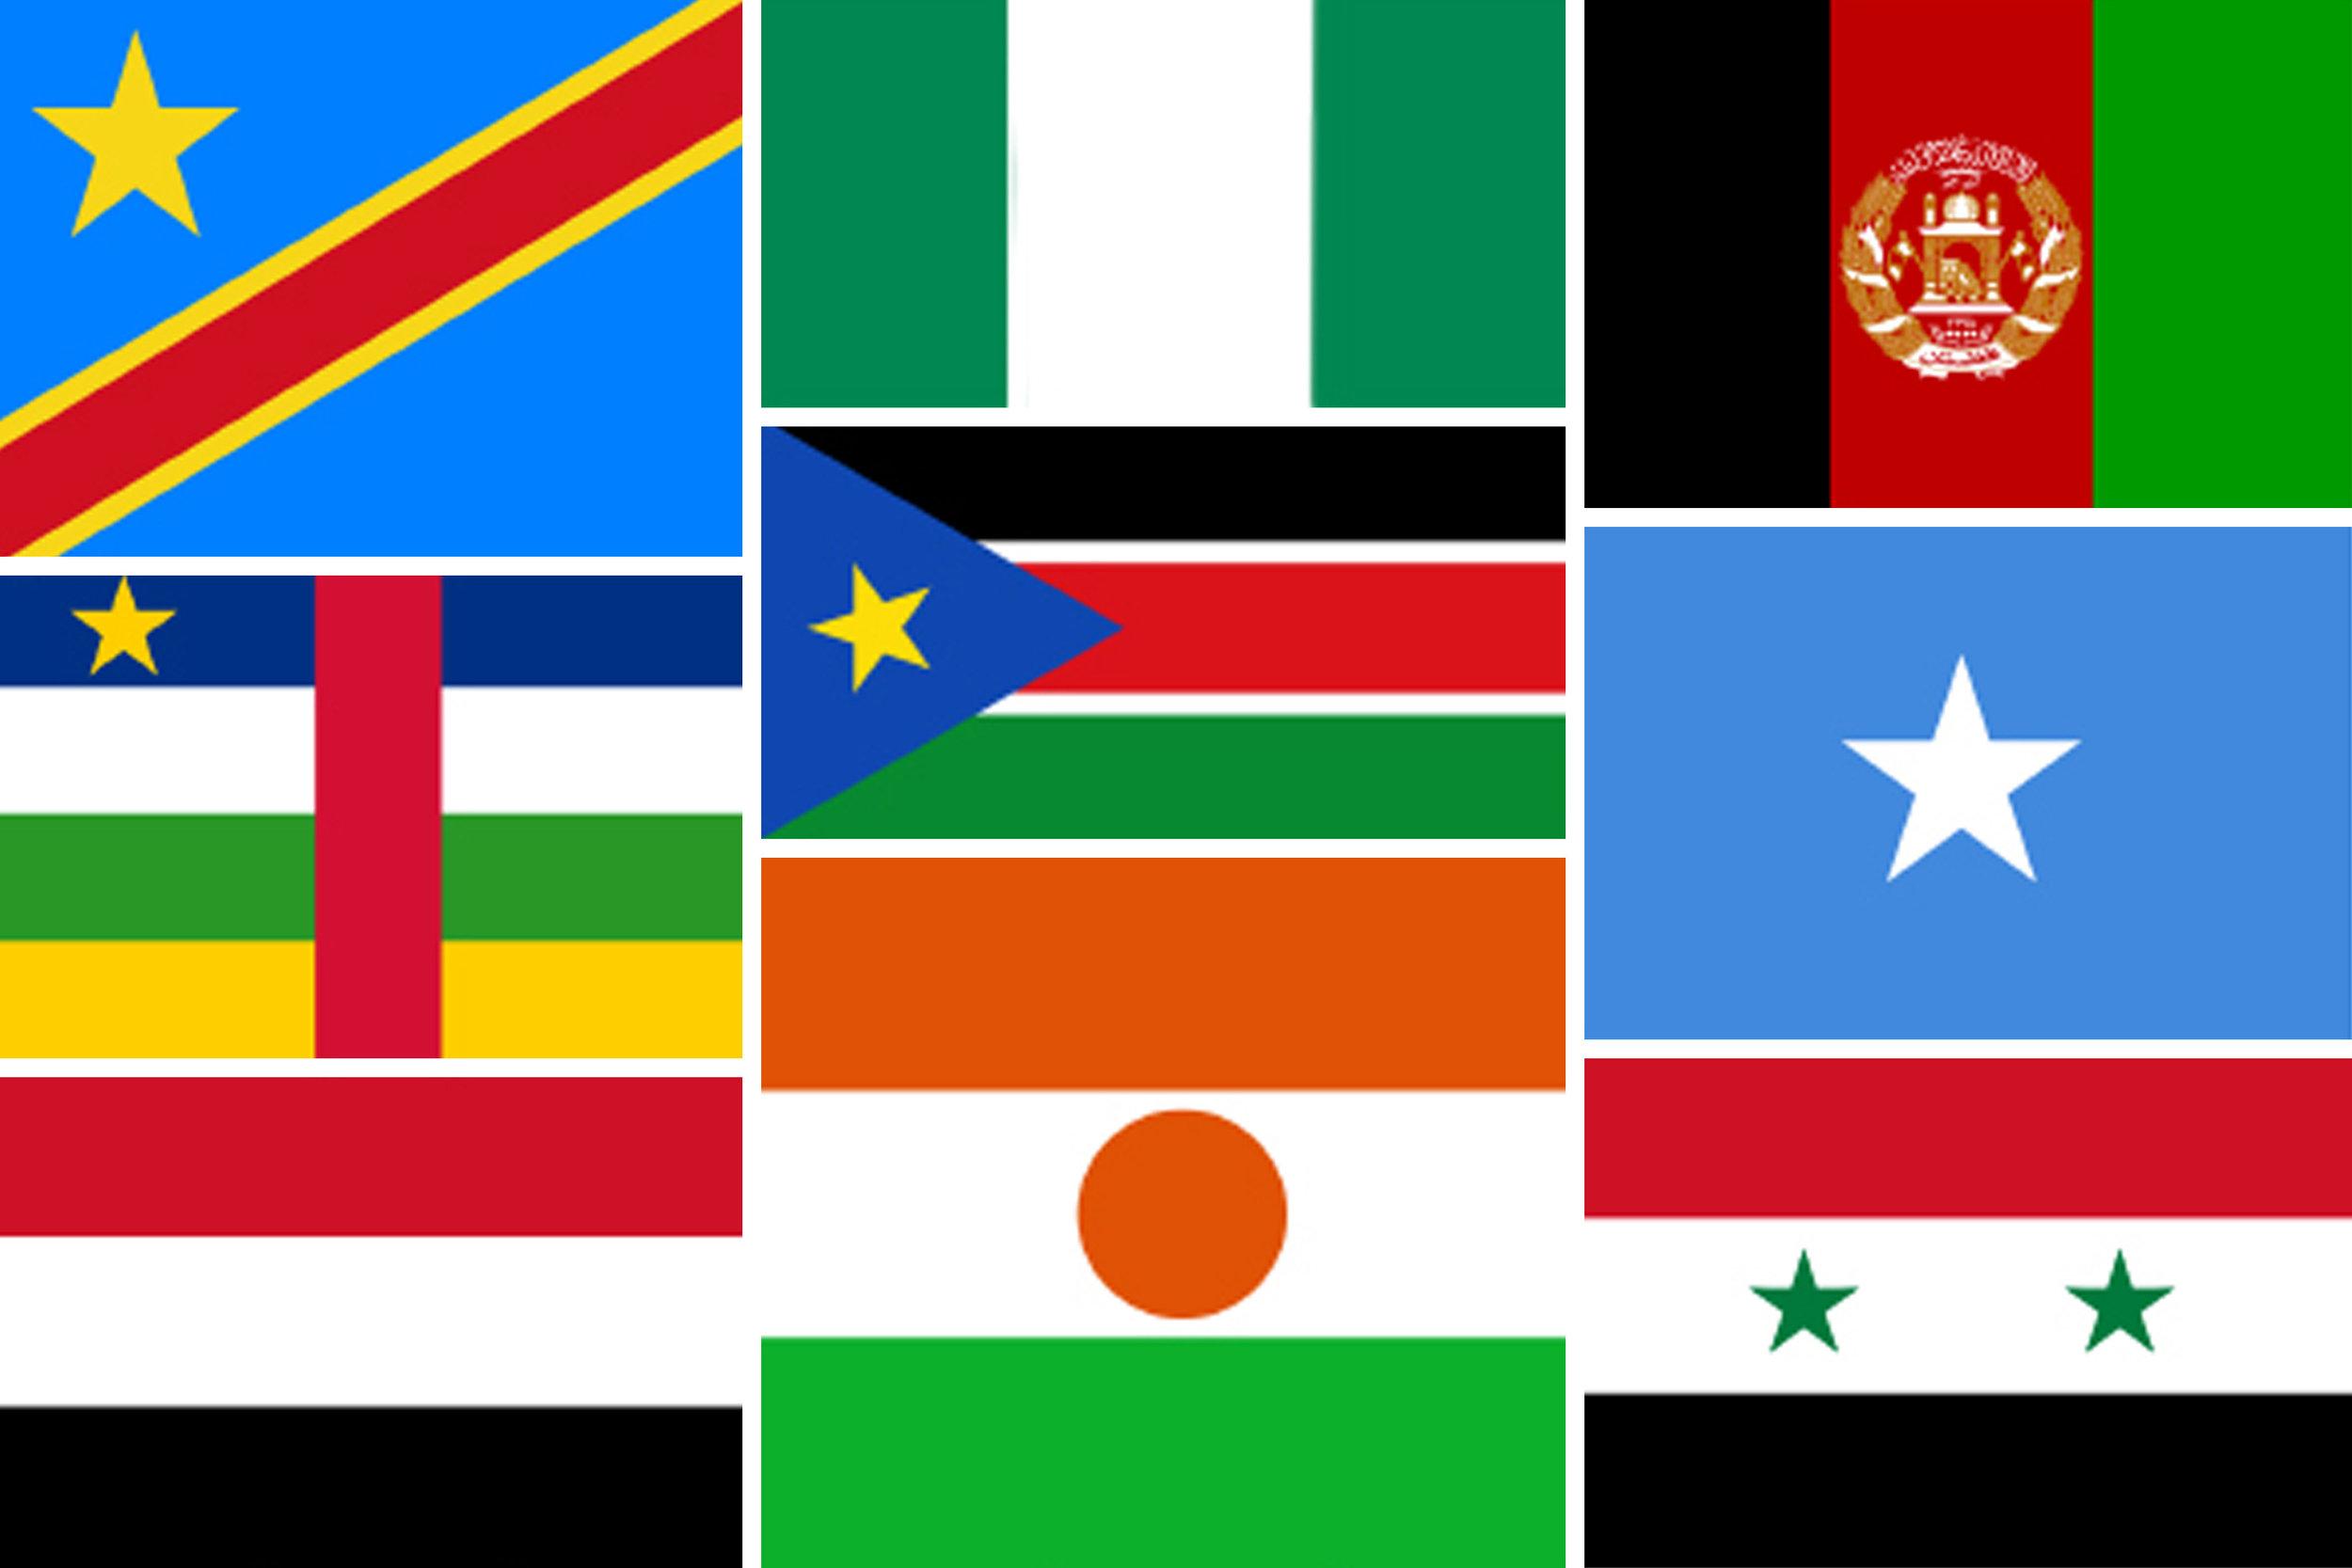 Migropoli_Flags.jpg